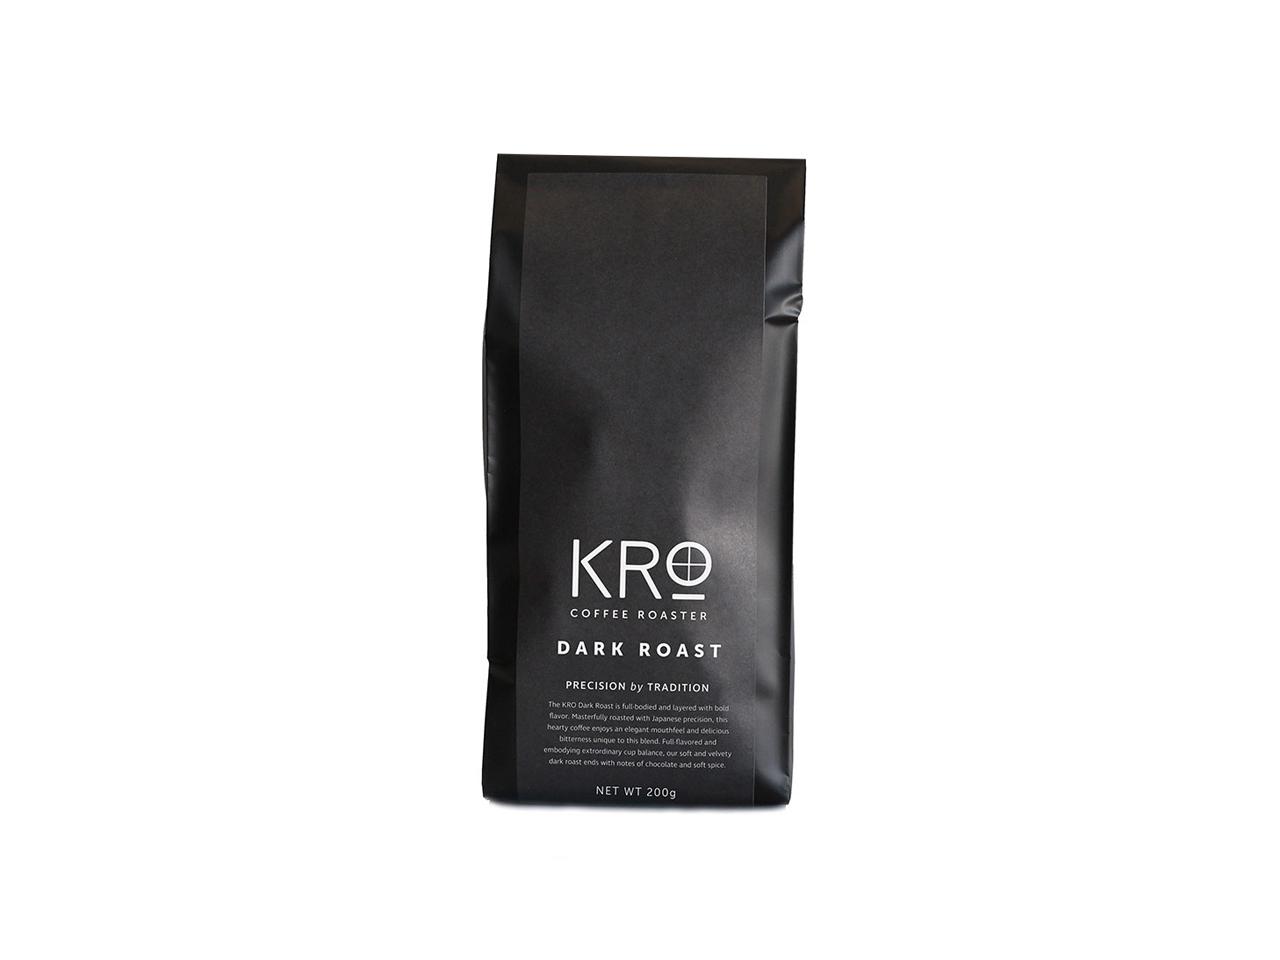 KROプレミアム ダークロースト コーヒー豆  200g